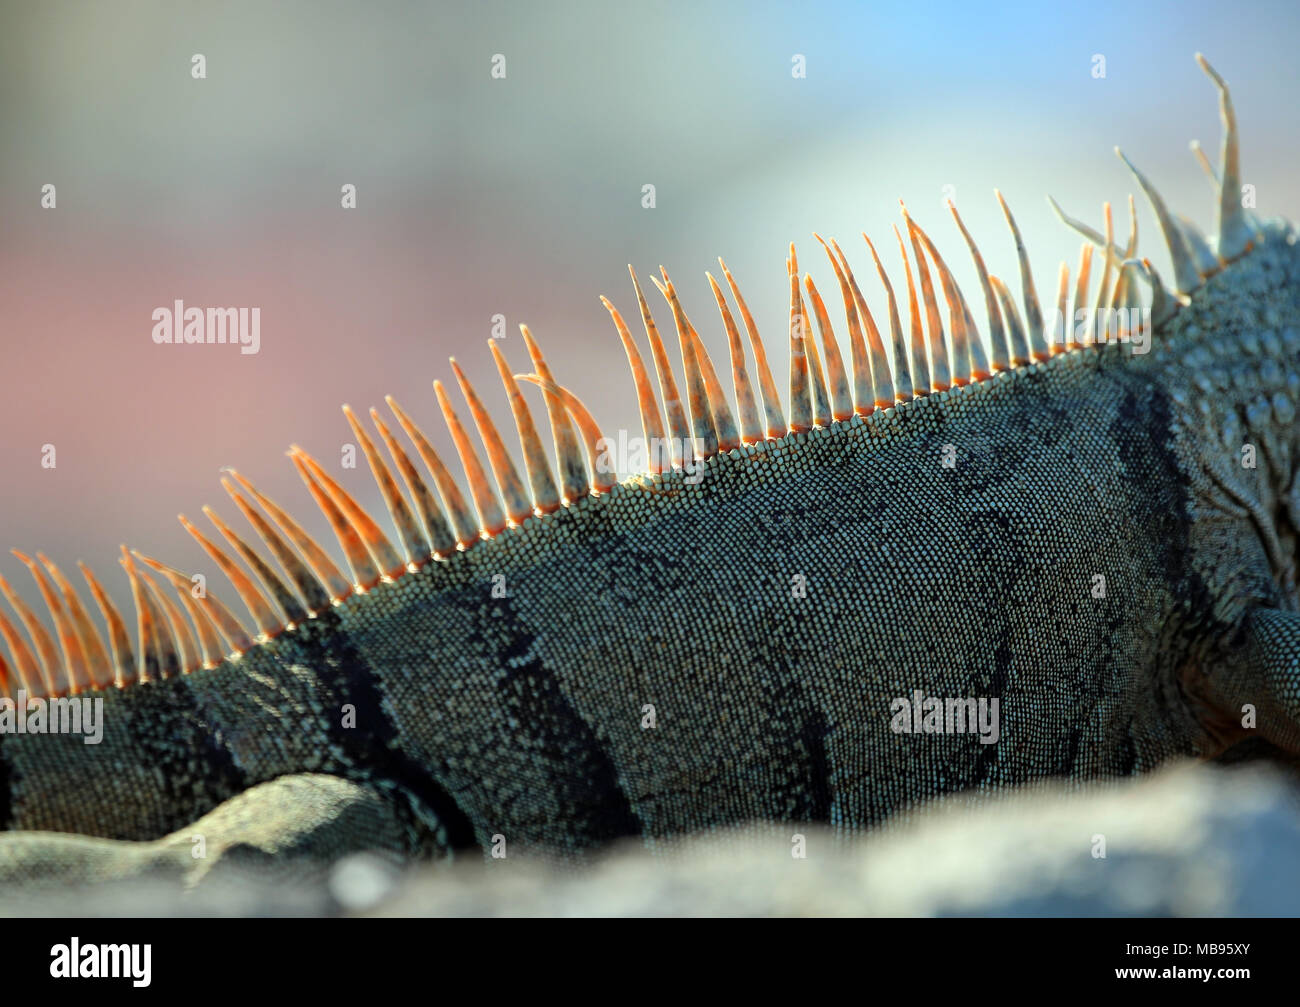 detail of iguana reddish tail spines - Stock Image